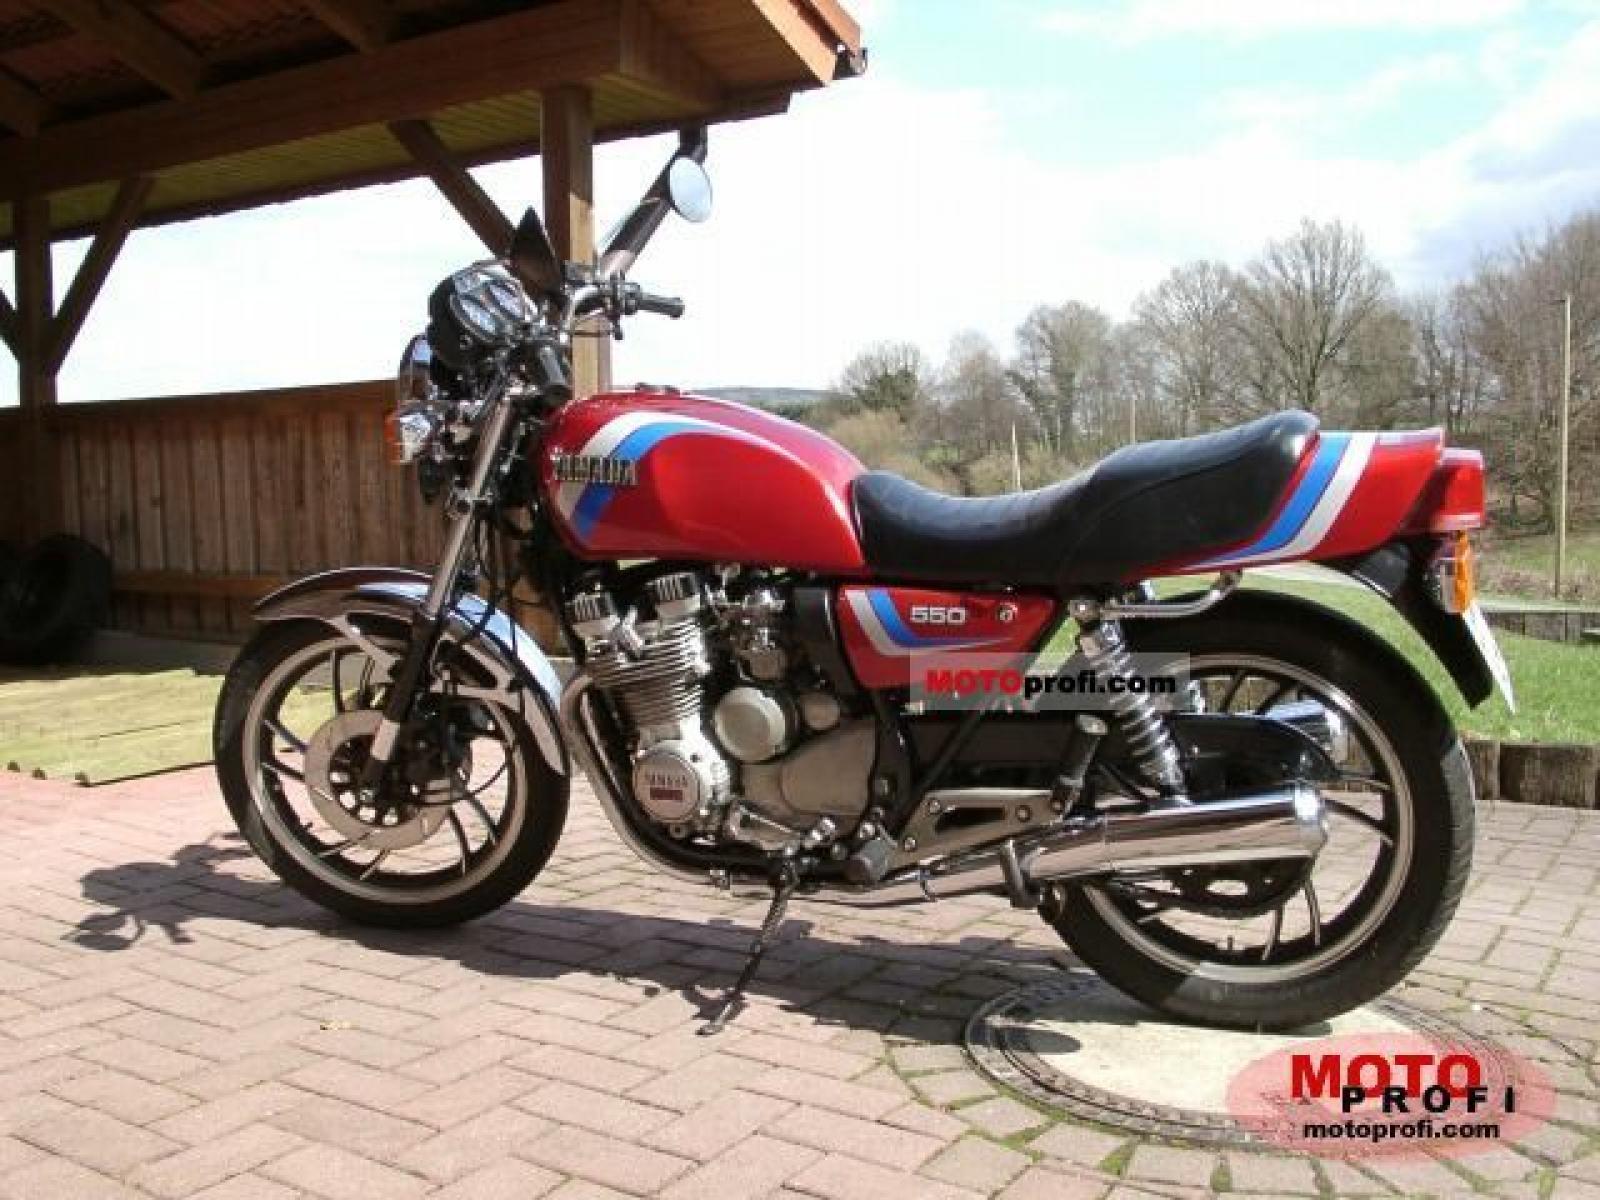 hight resolution of 1981 yamaha xj 550 h motozombdrivecom yamaha xj 550 h 1981 3 1981 yamaha xj 550 yamaha xz 550 wiring schematic